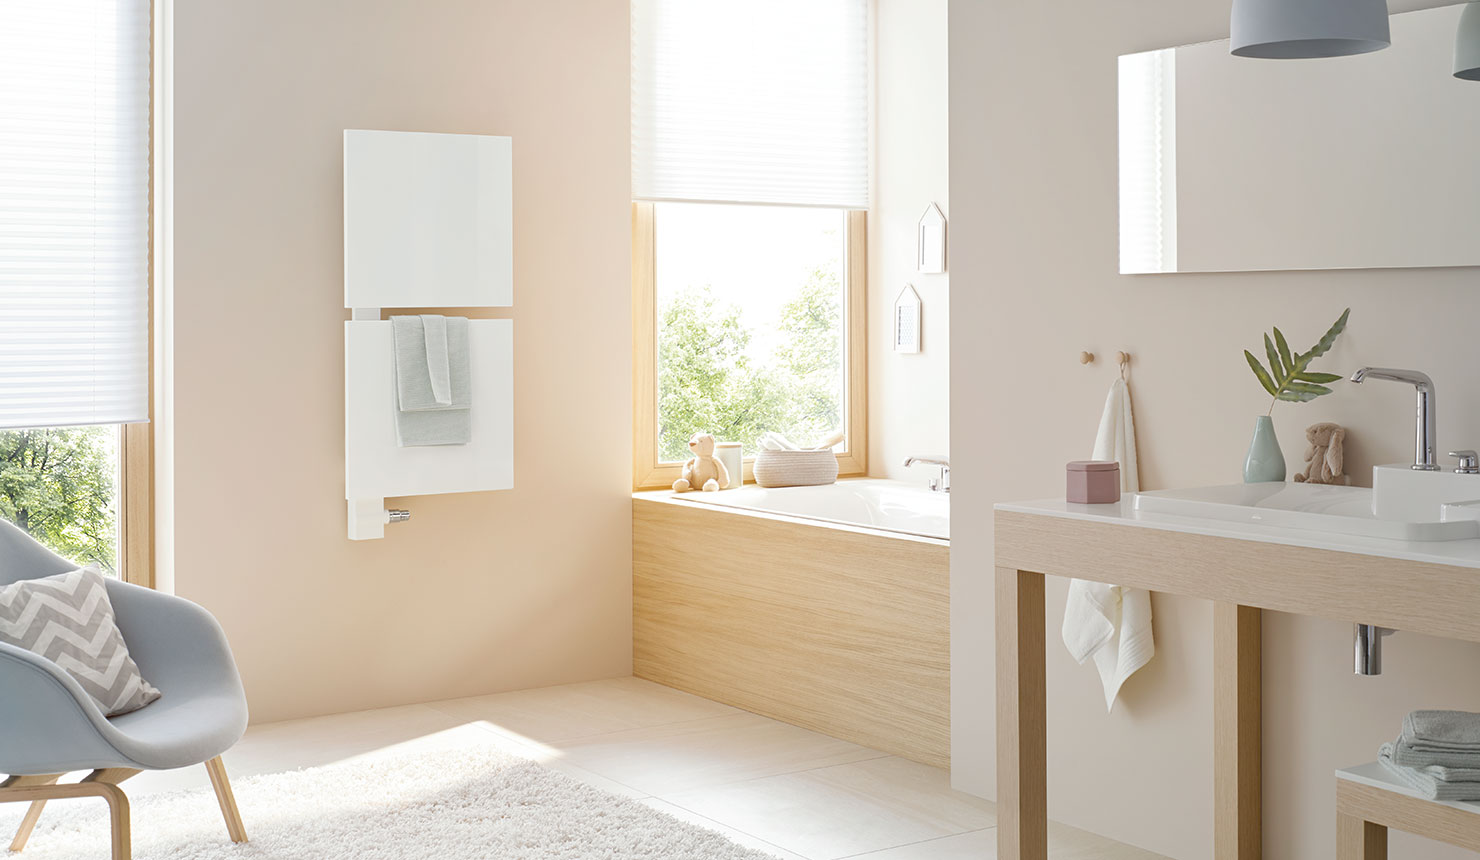 Full Size of Kermi Flachheizkörper Signo Design Und Badheizkrper Wohnzimmer Kermi Flachheizkörper